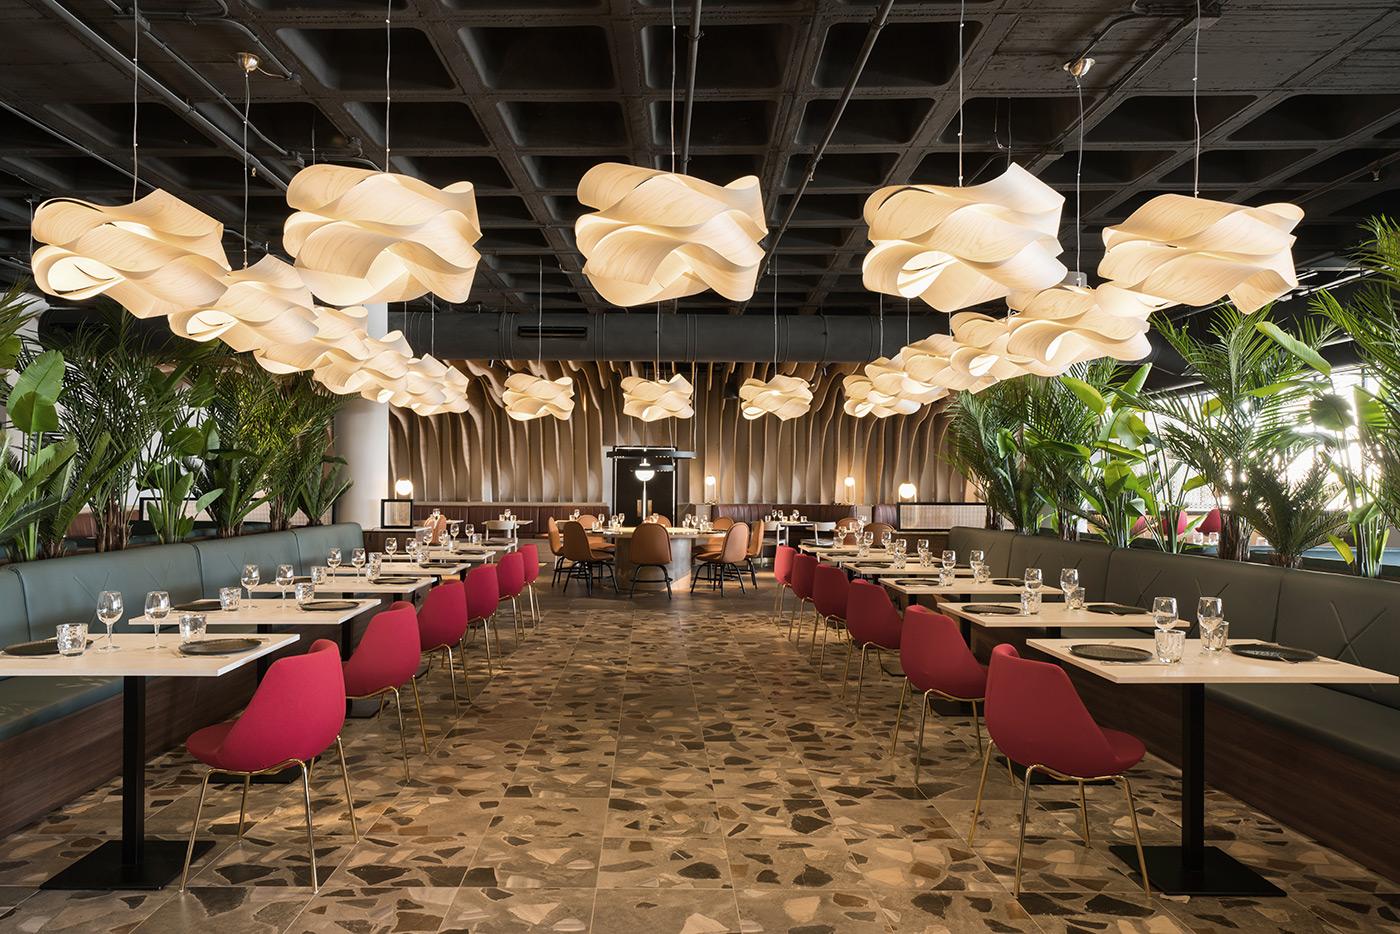 Ladon Grill Restaurant